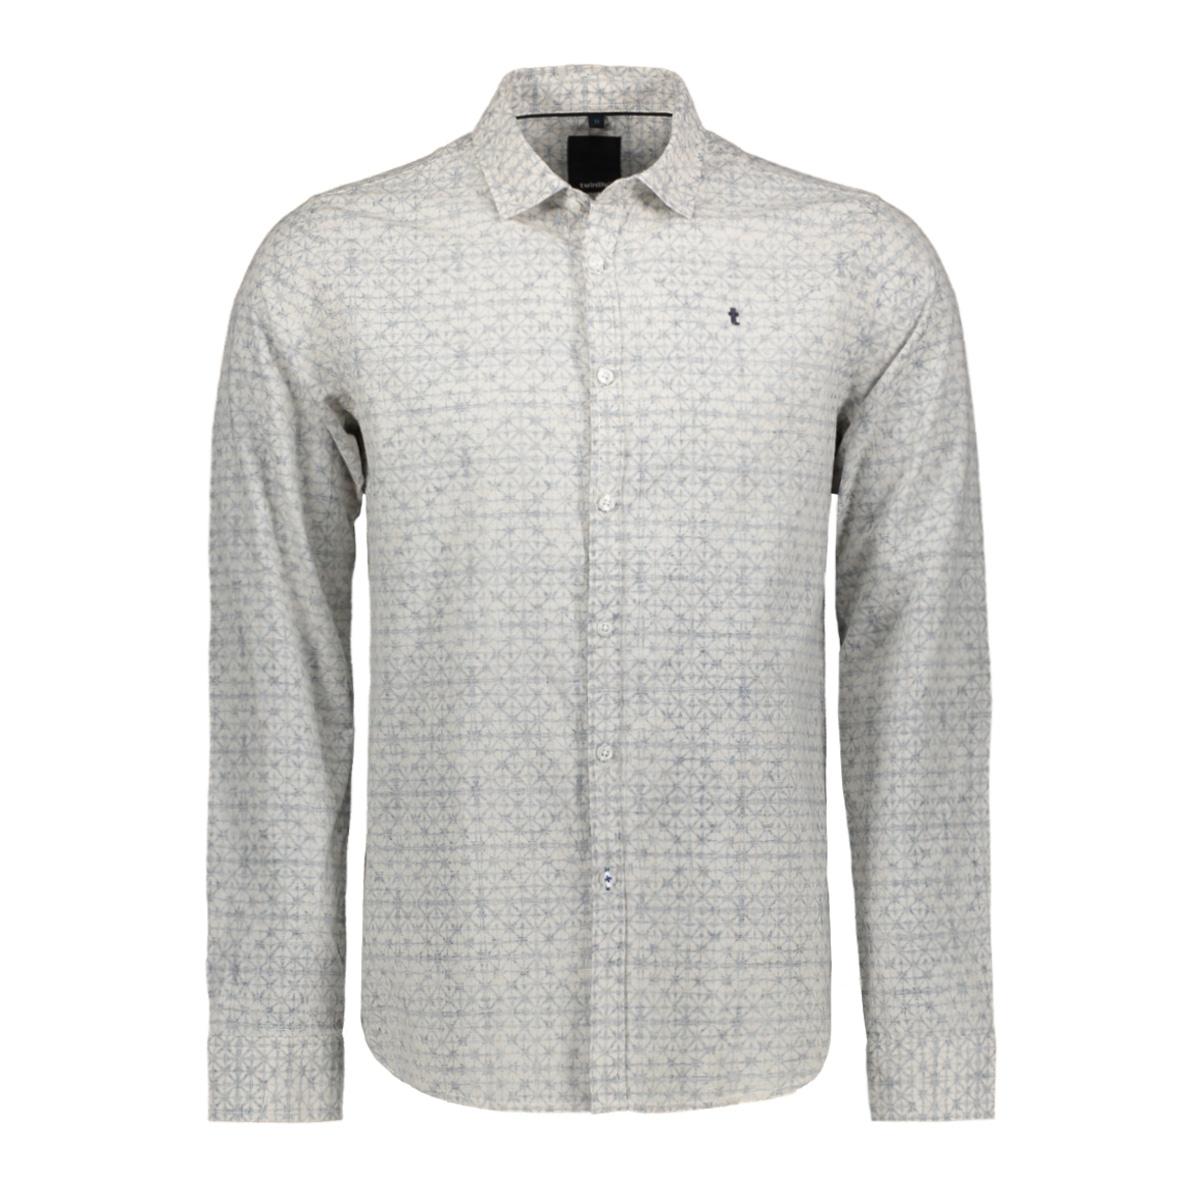 1901 2201 m 1 twinlife overhemd 1010 blanc